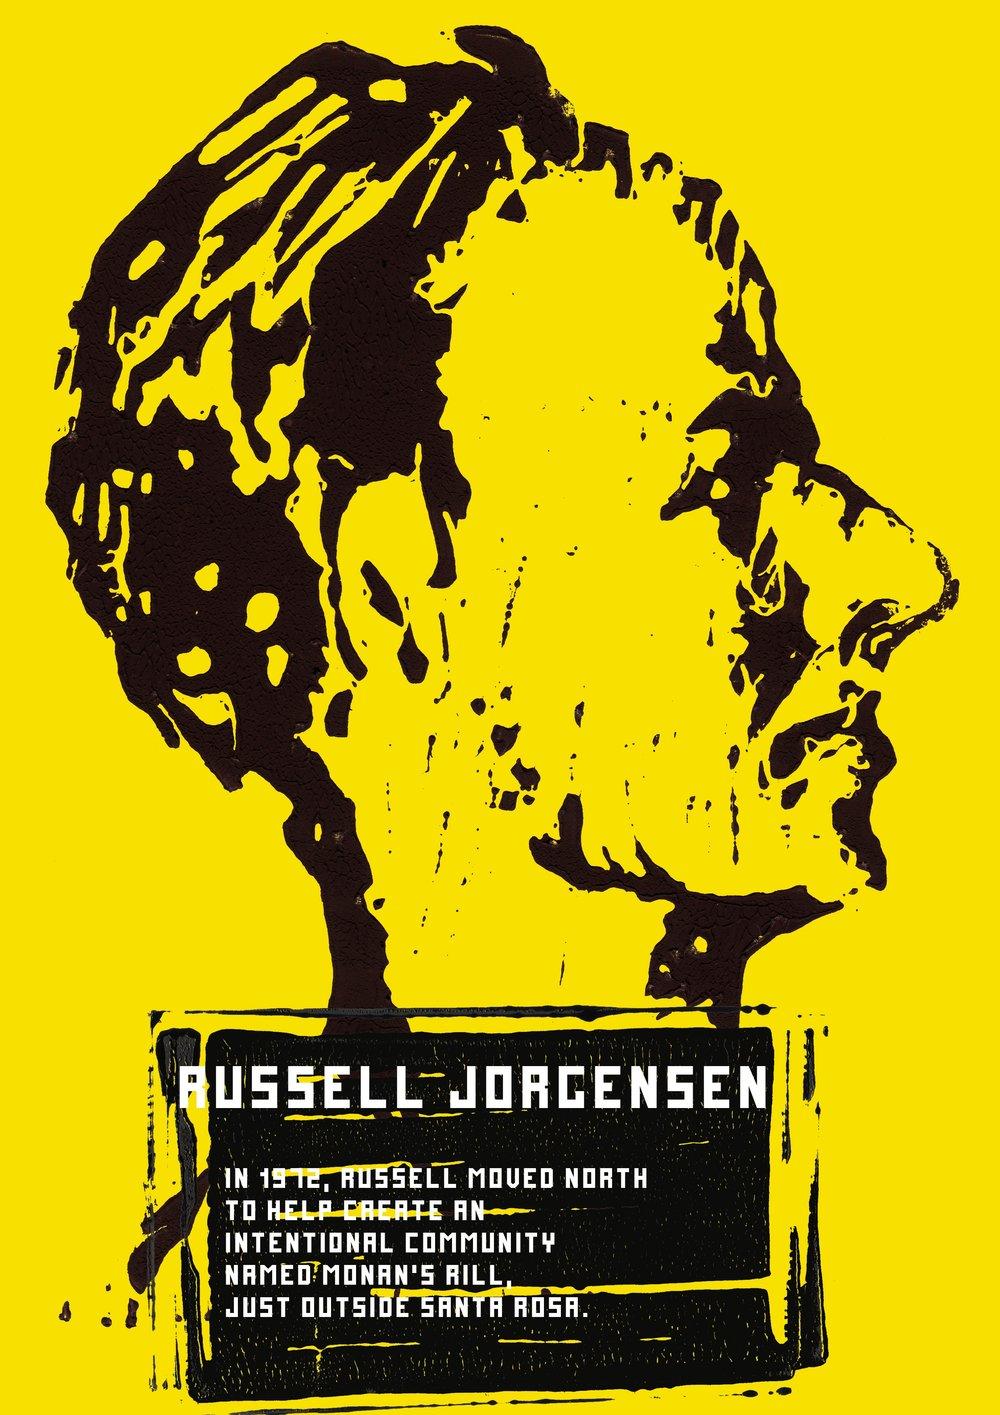 Russell Jorgensen